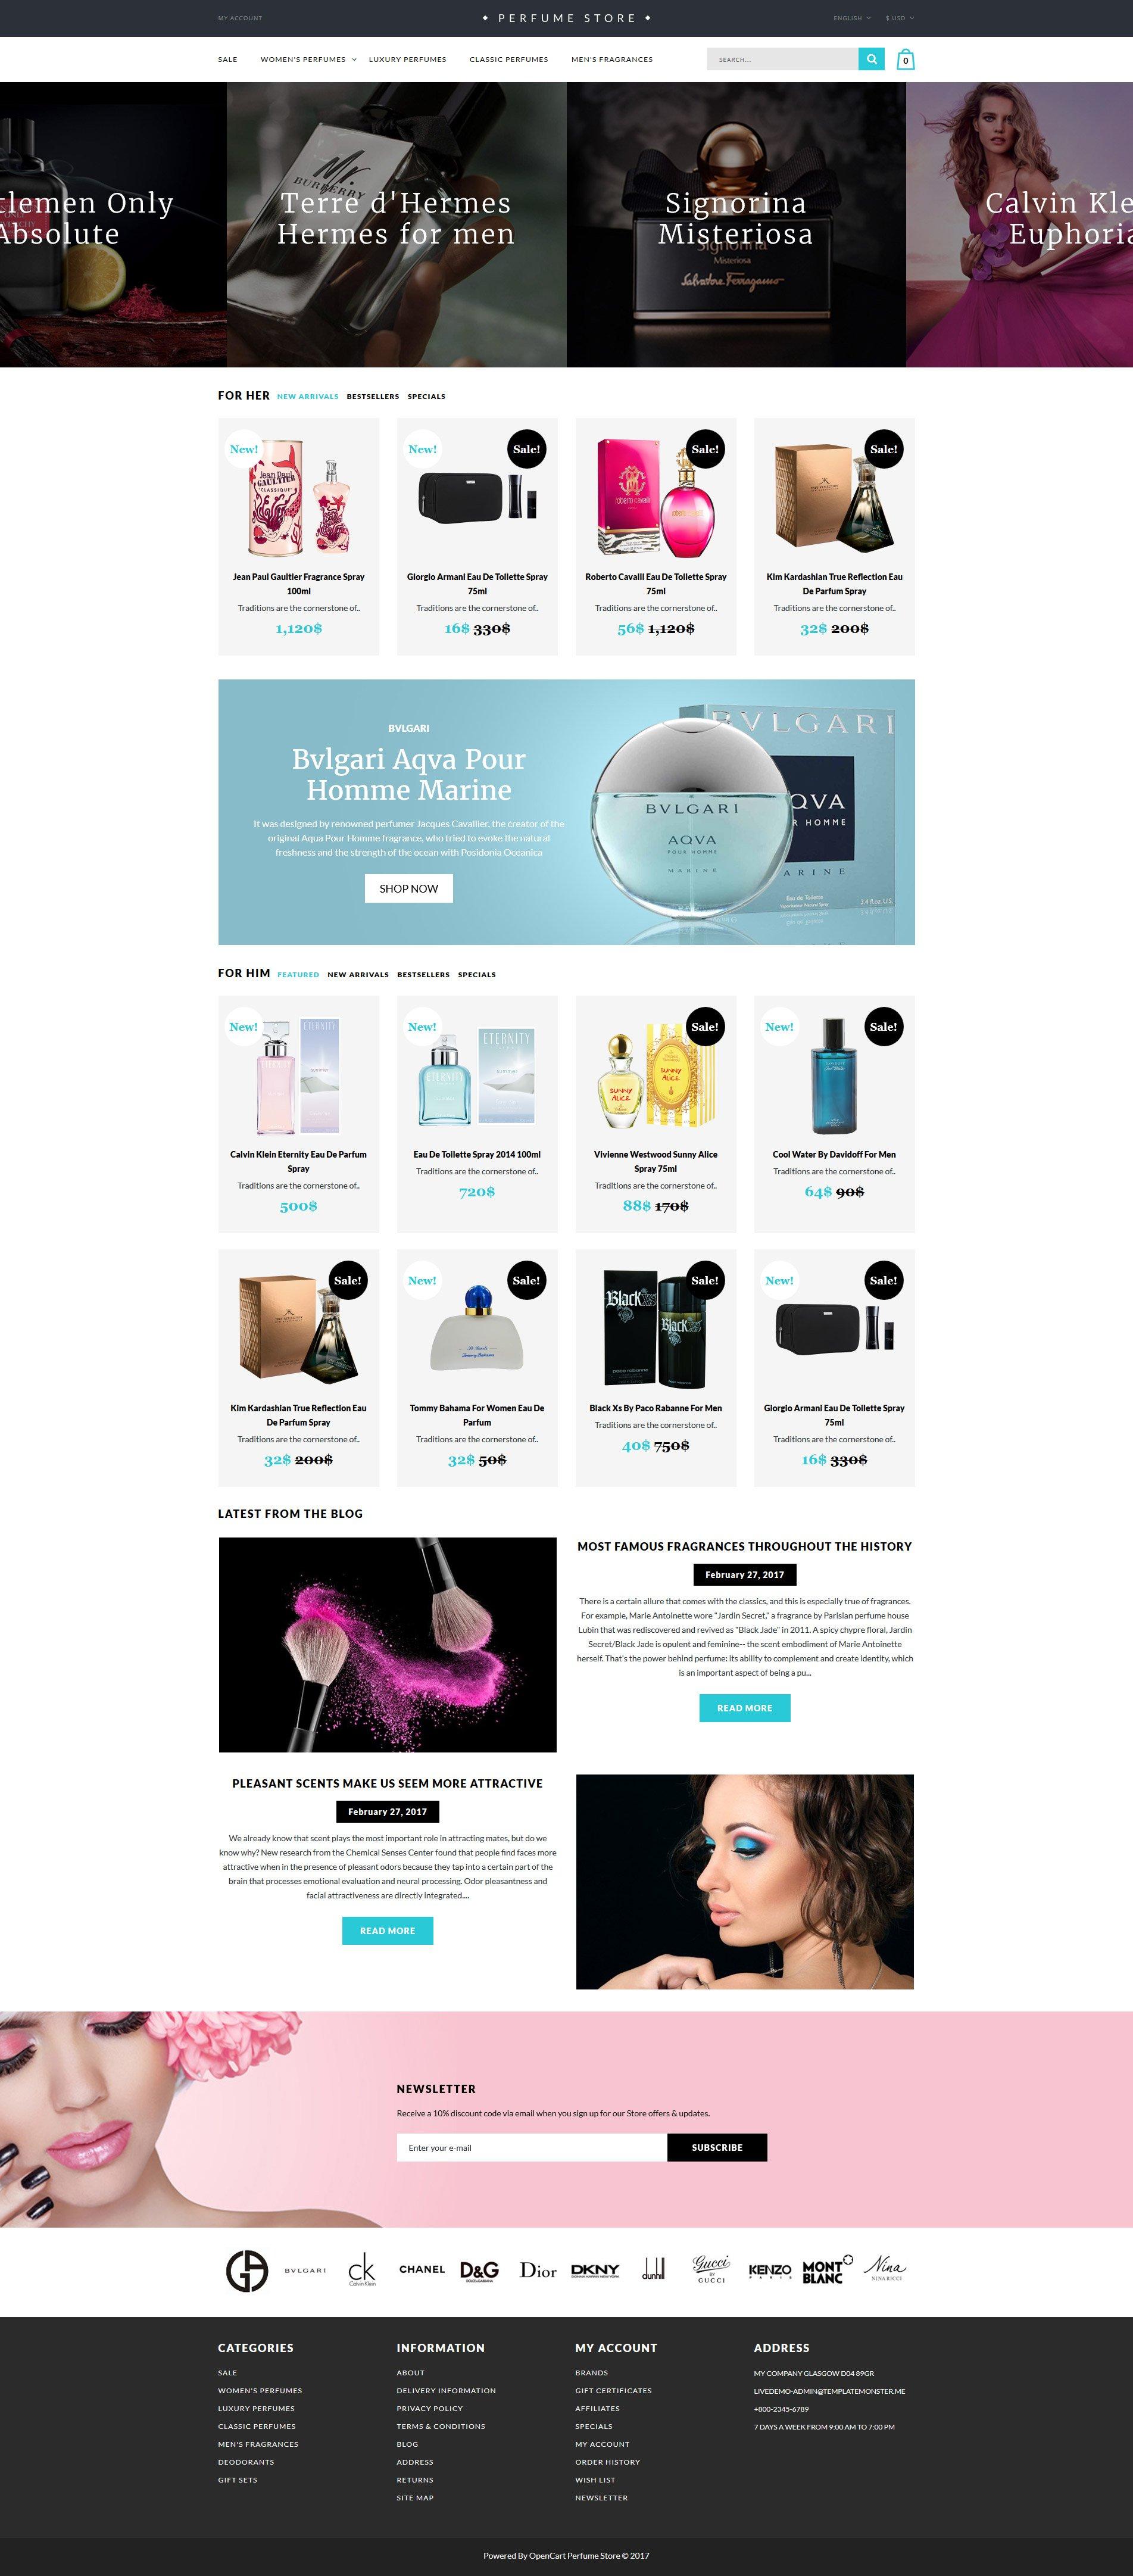 Cosmetics Store Templates | TemplateMonster